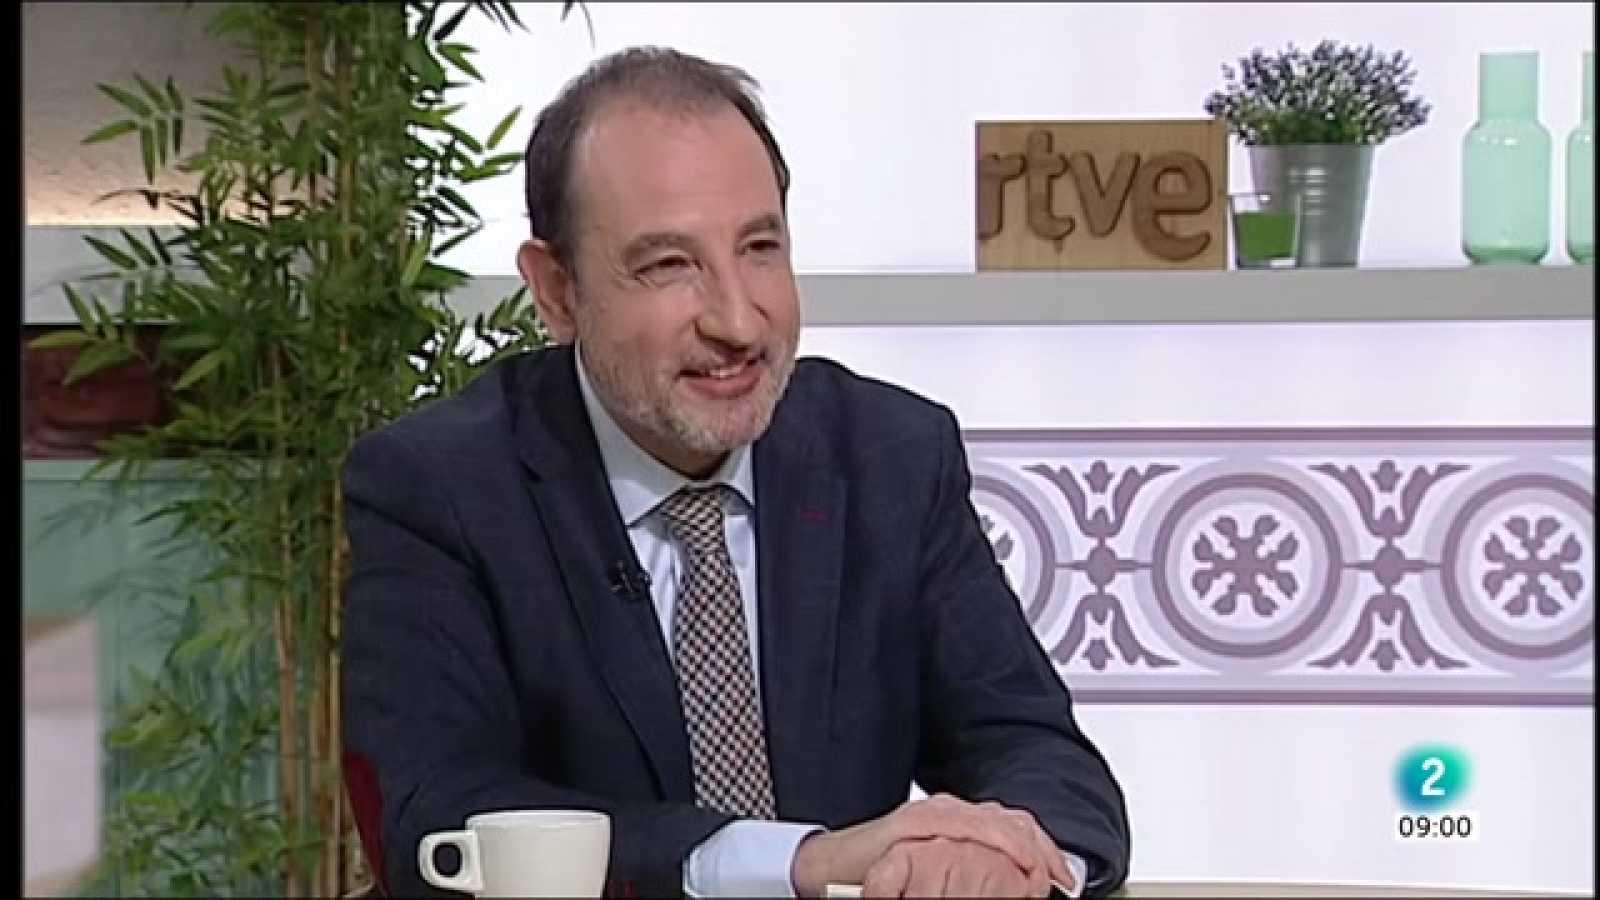 Gemma Nierga entrevista Ramon Espadaler al Cafè d'idees